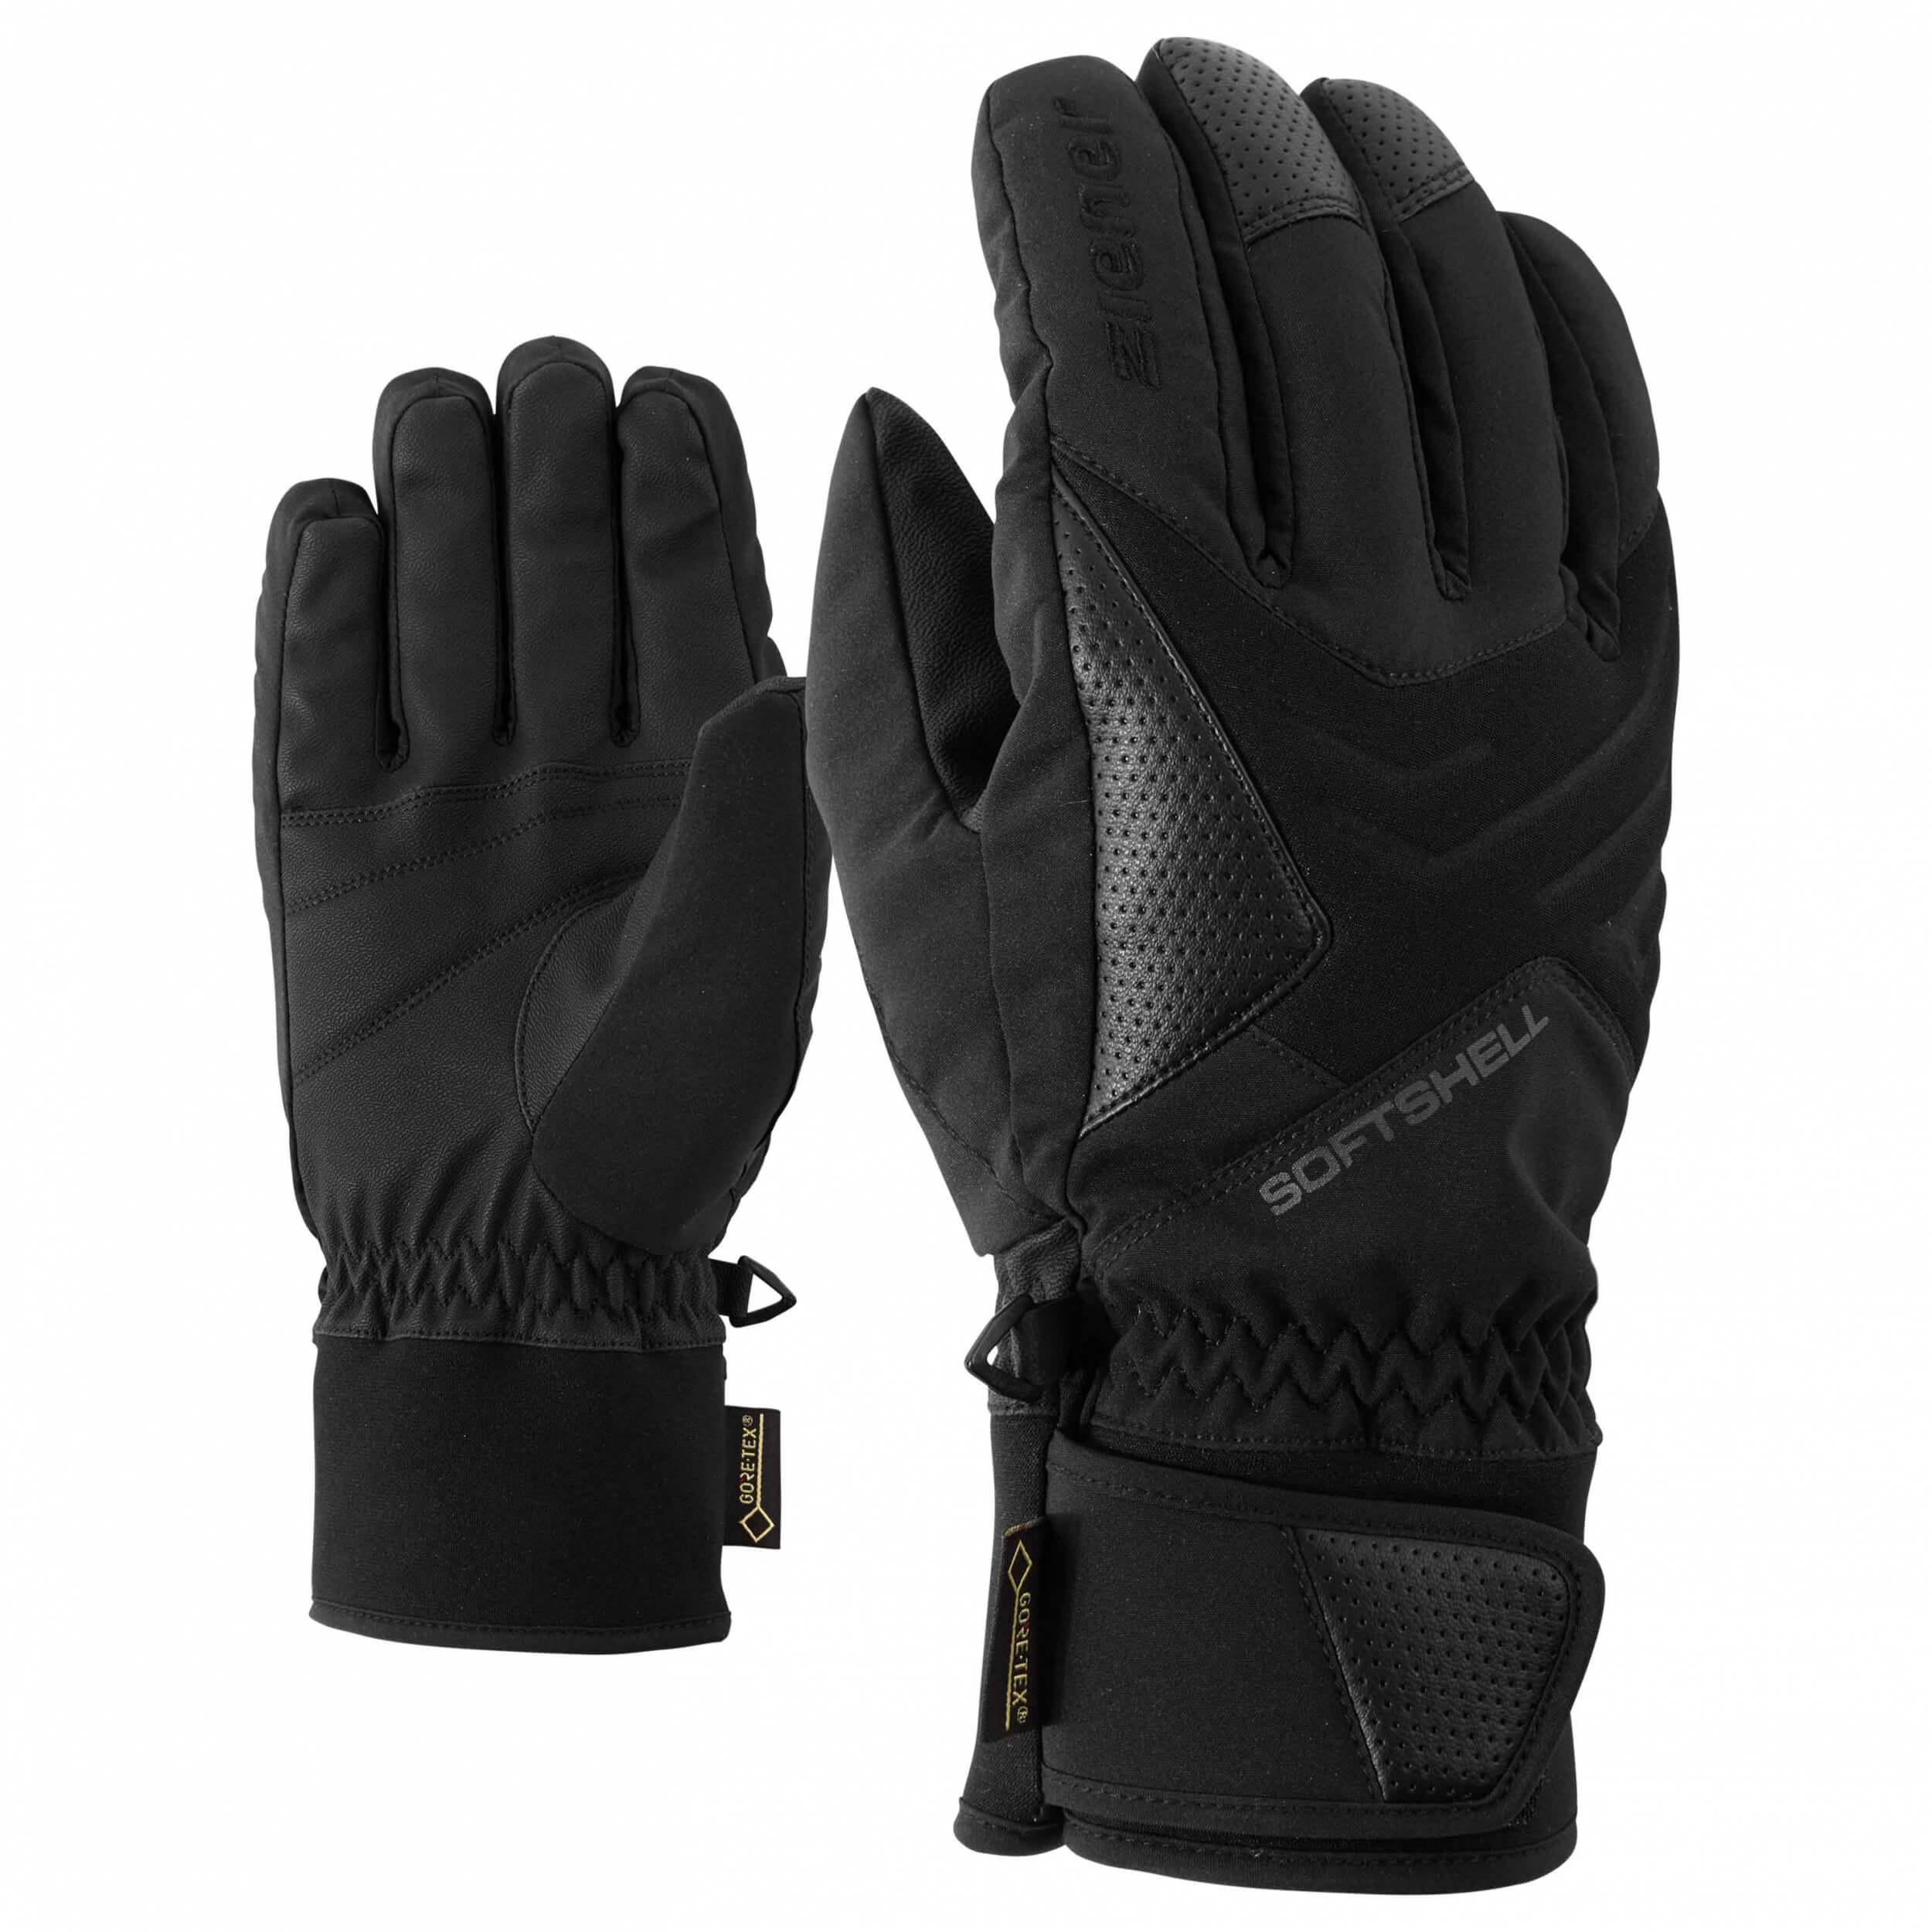 ZIENER Ski Handschuhe Gomser GORETEX schwarz 12